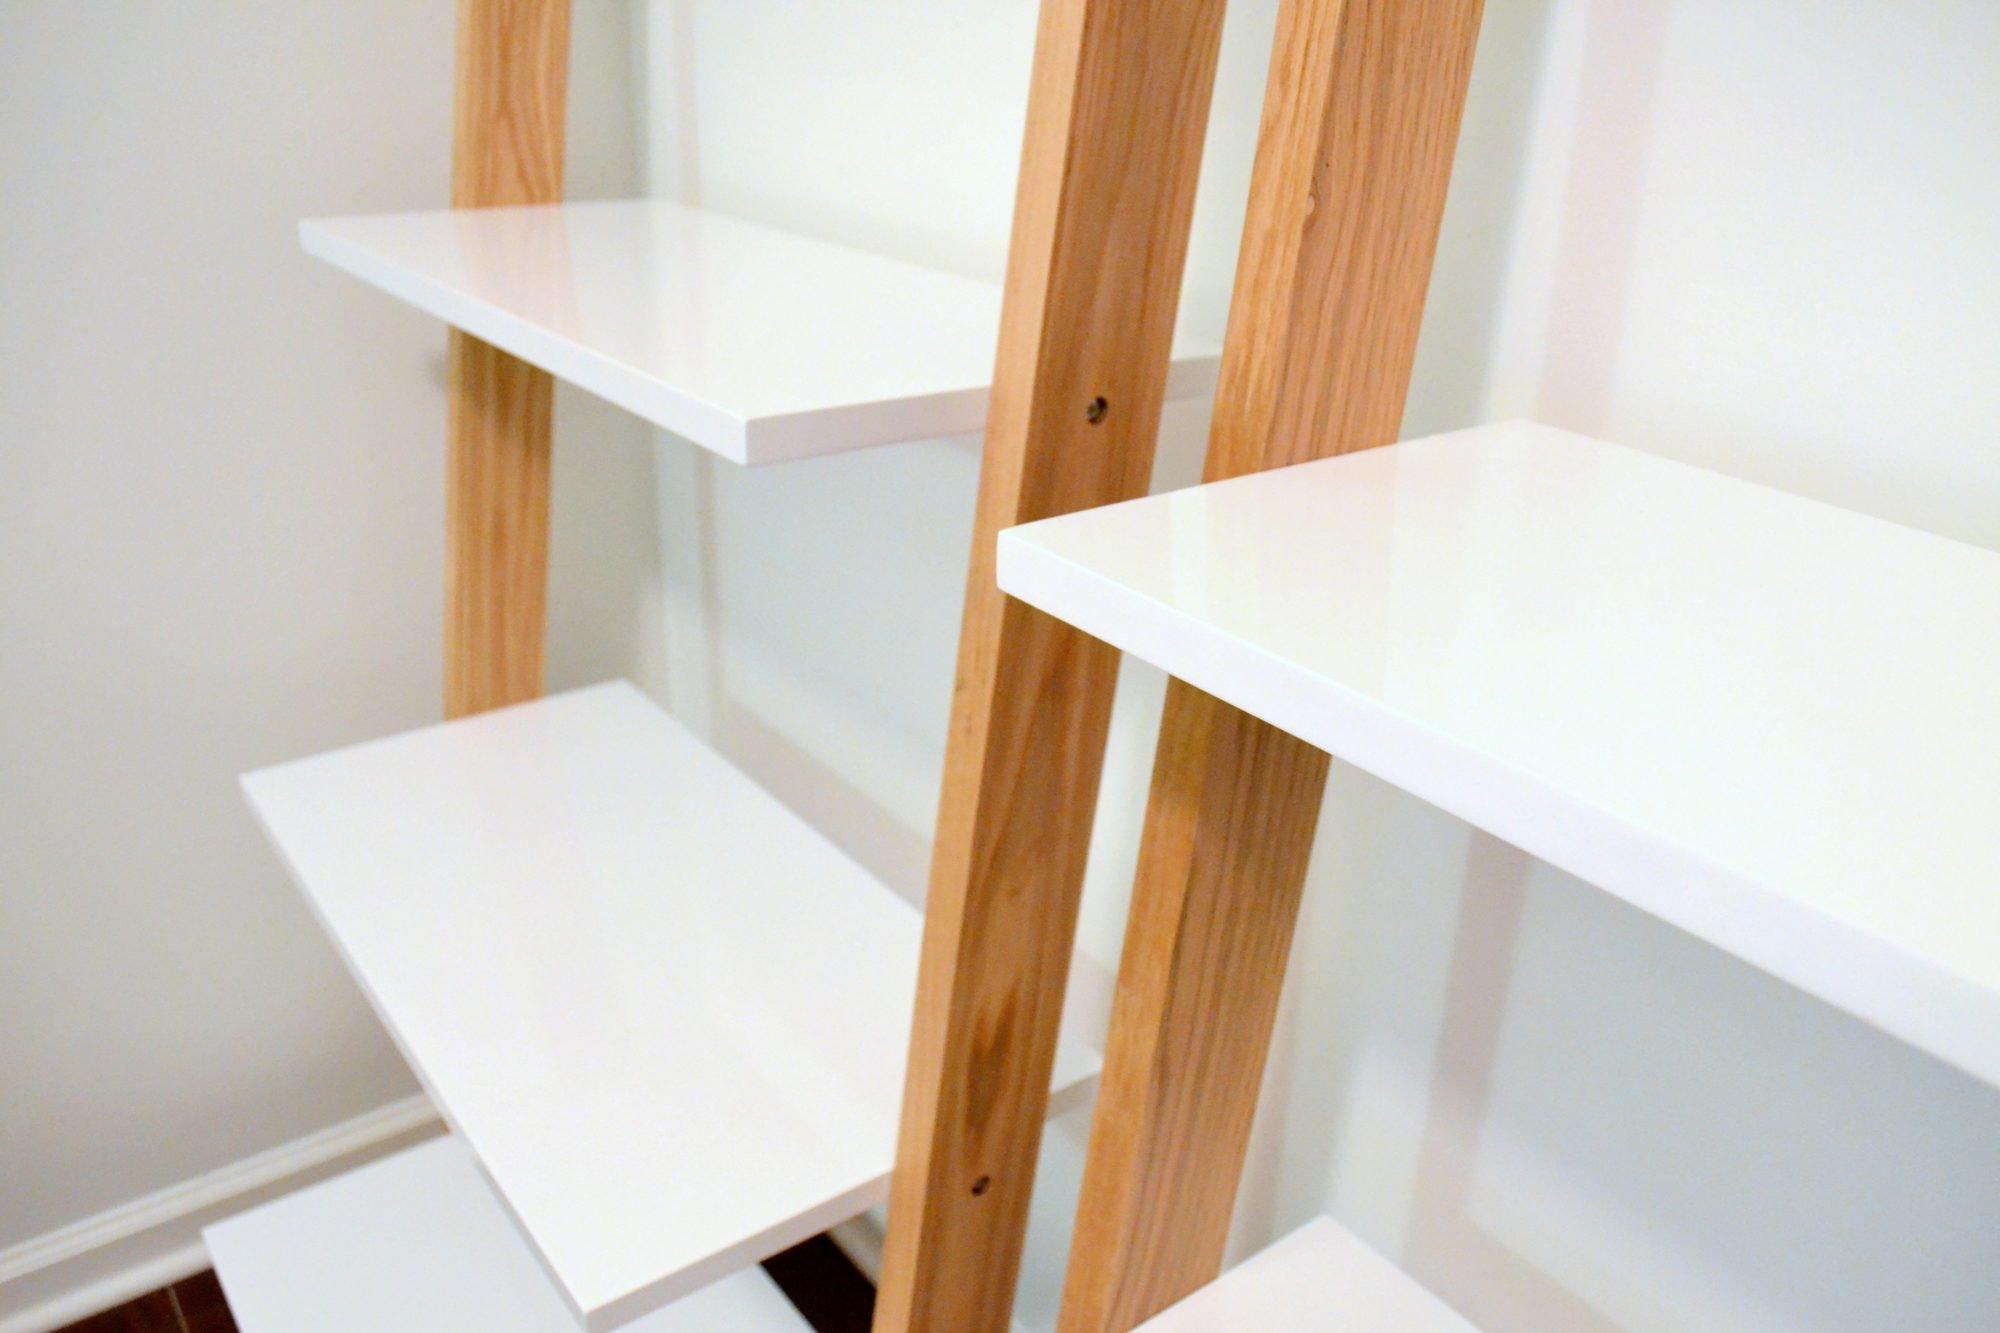 Bookshelf Building in the Office